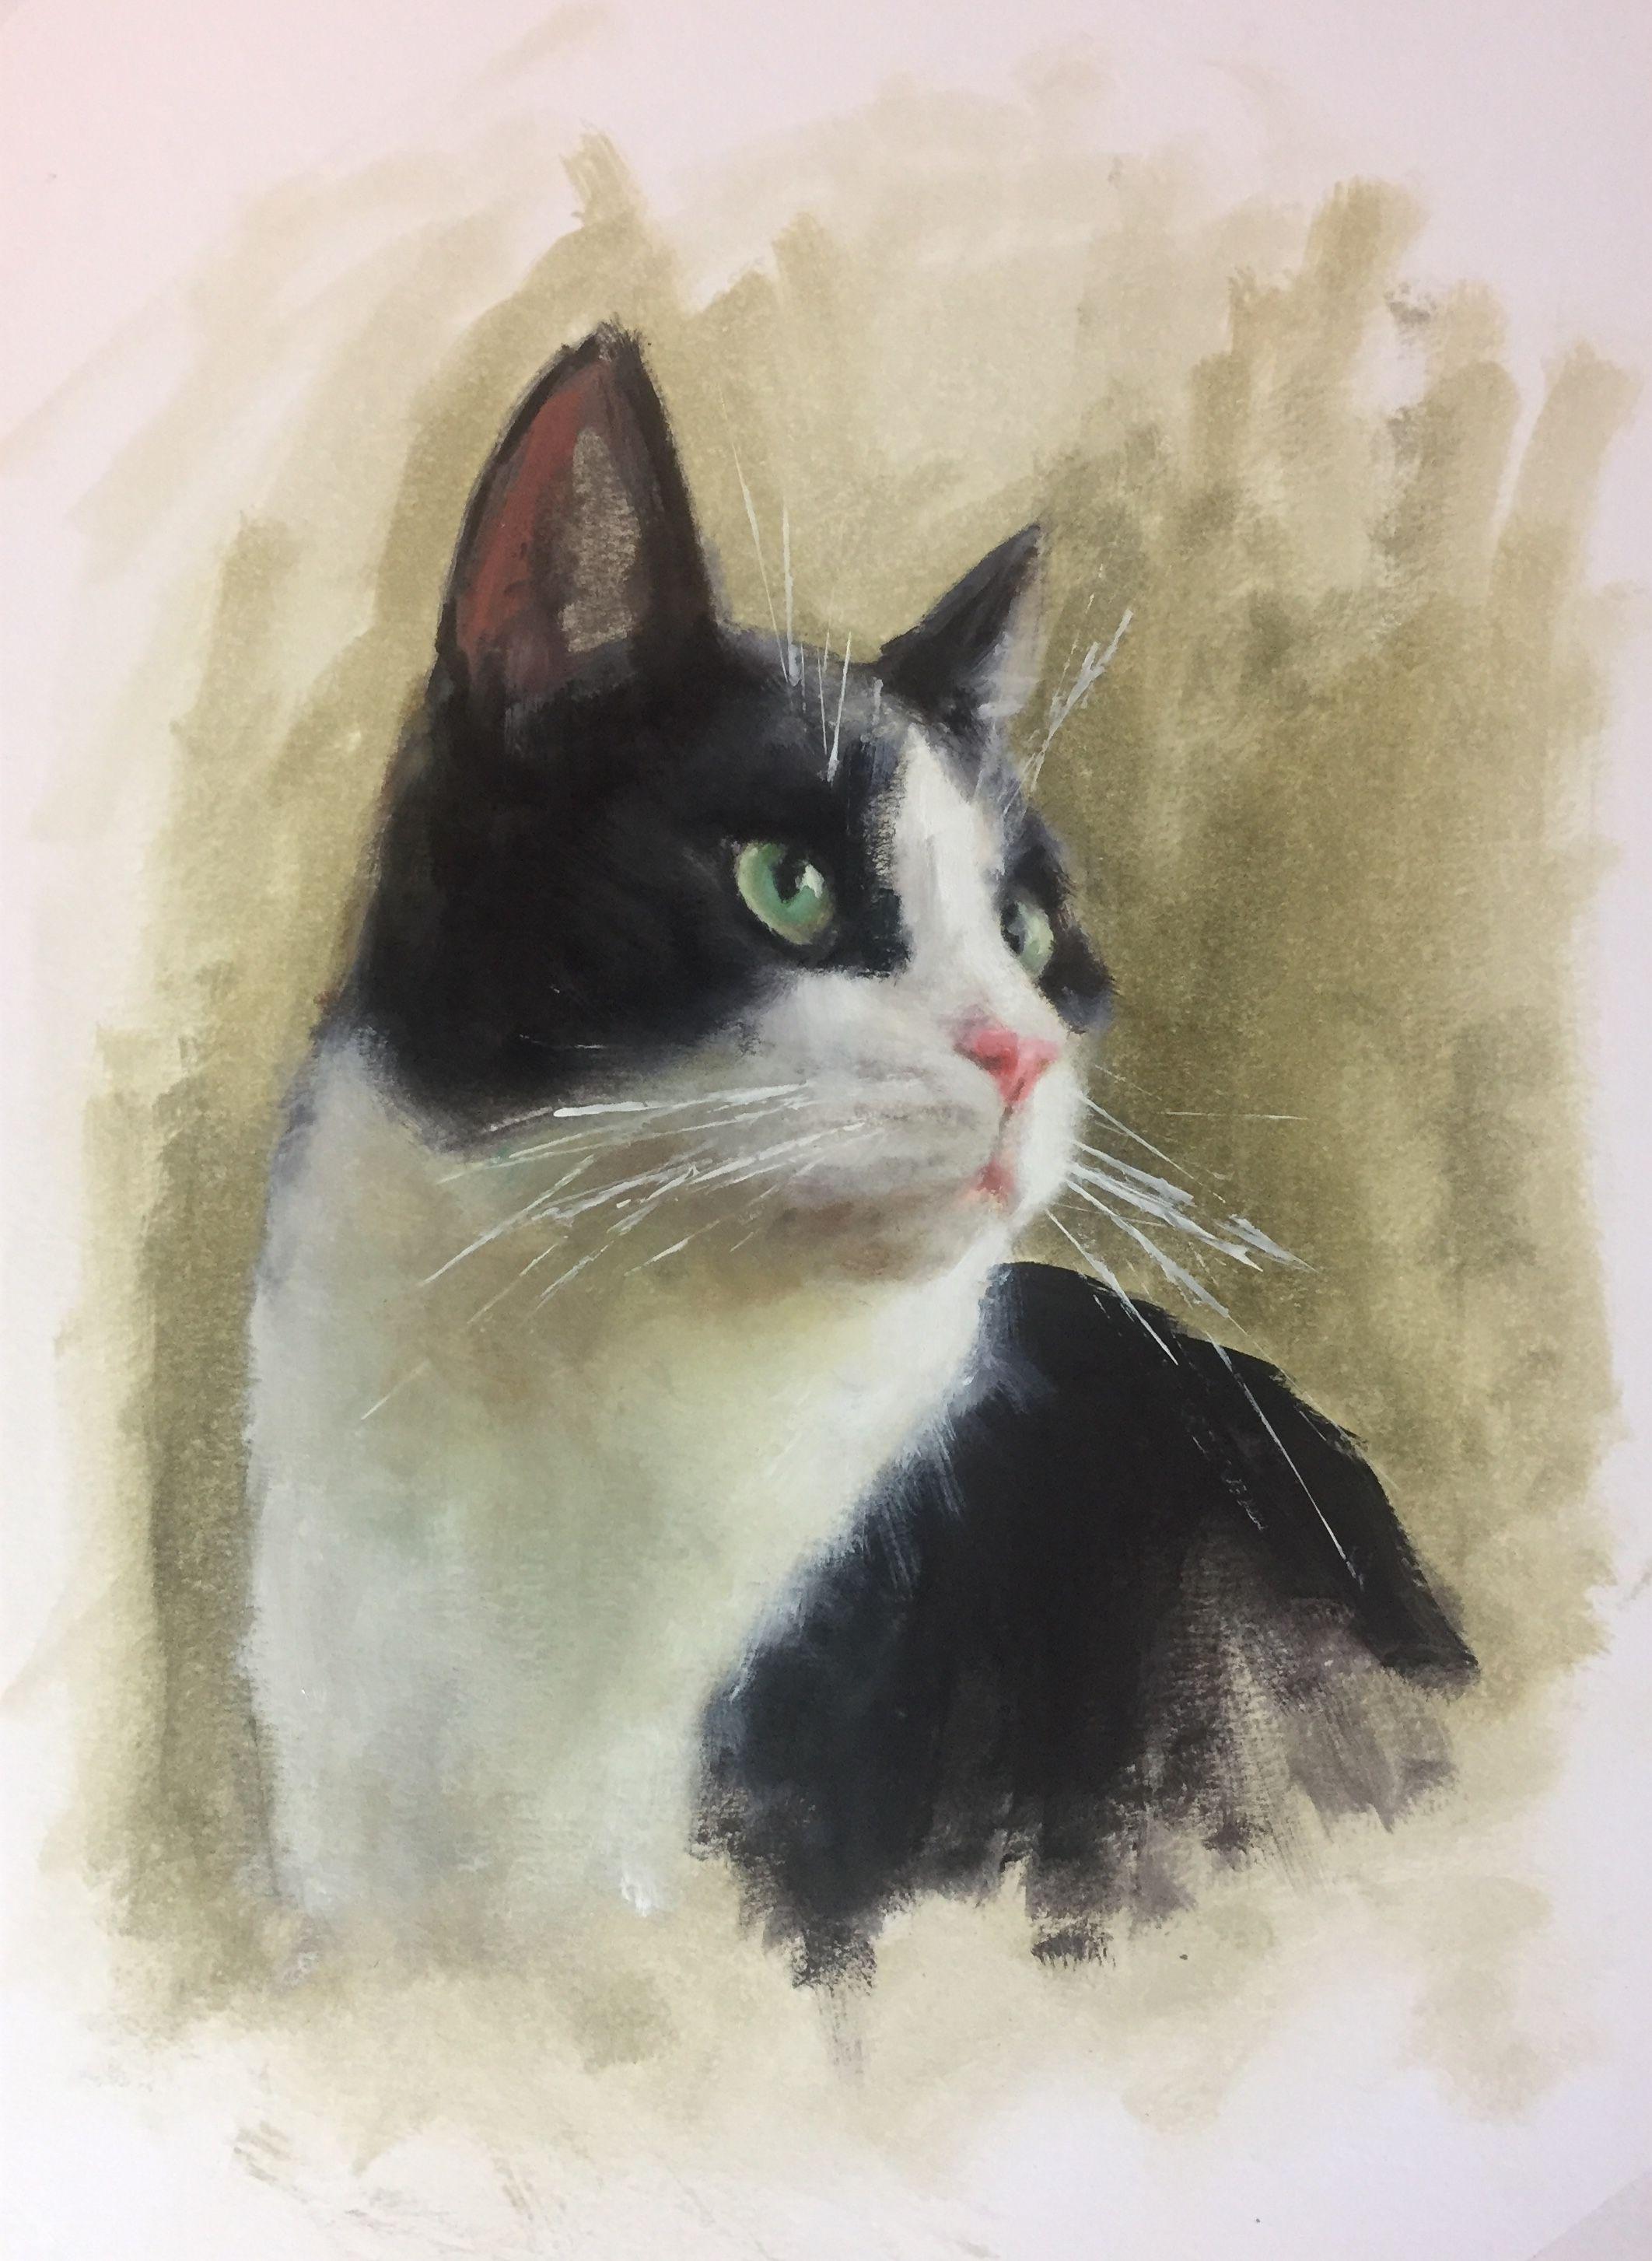 Sleeping cat painting cat drawing cute cat  painting kitty painting art cat contemporary painting british shorthair cat animal painting